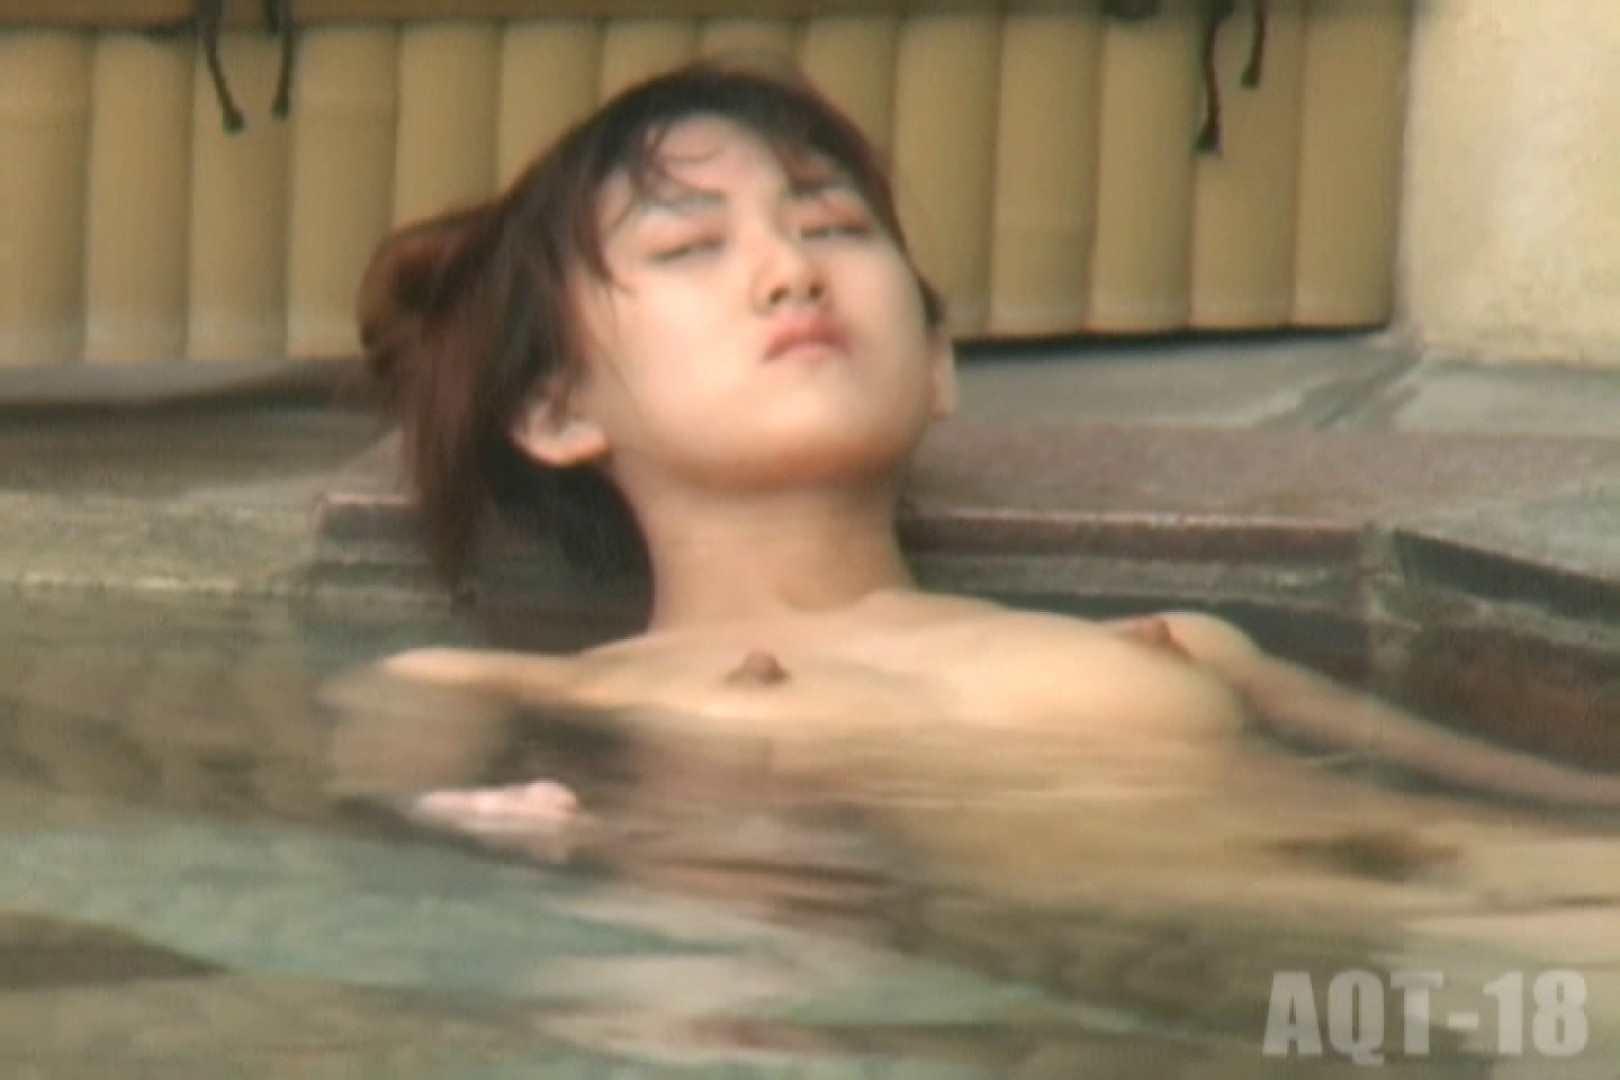 Aquaな露天風呂Vol.862 美しいOLの裸体 戯れ無修正画像 99pic 35